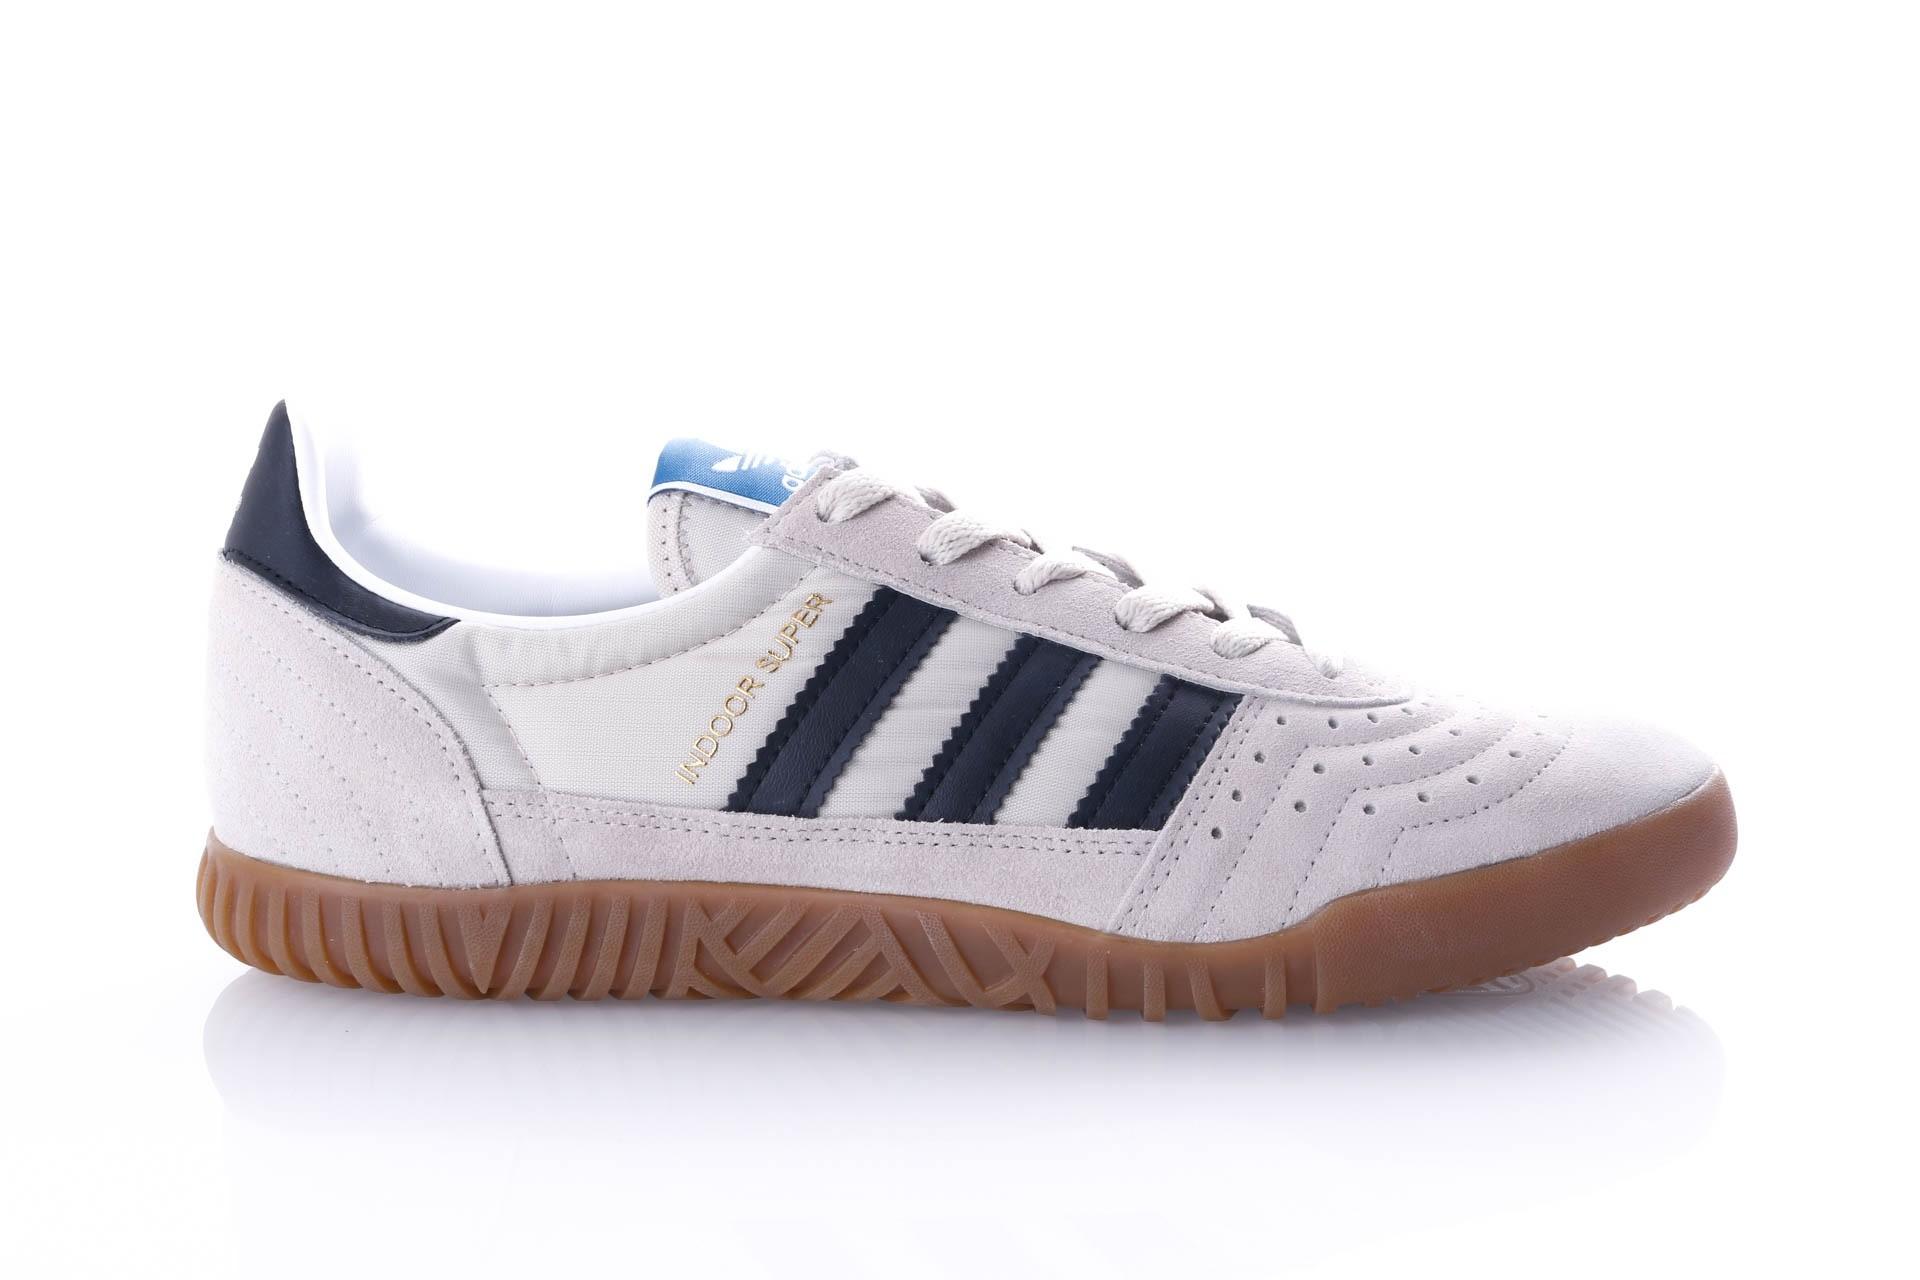 Foto van Adidas Indoor Super B41521 Sneakers TRACE CARGO/FTWR WHITE/GUM4